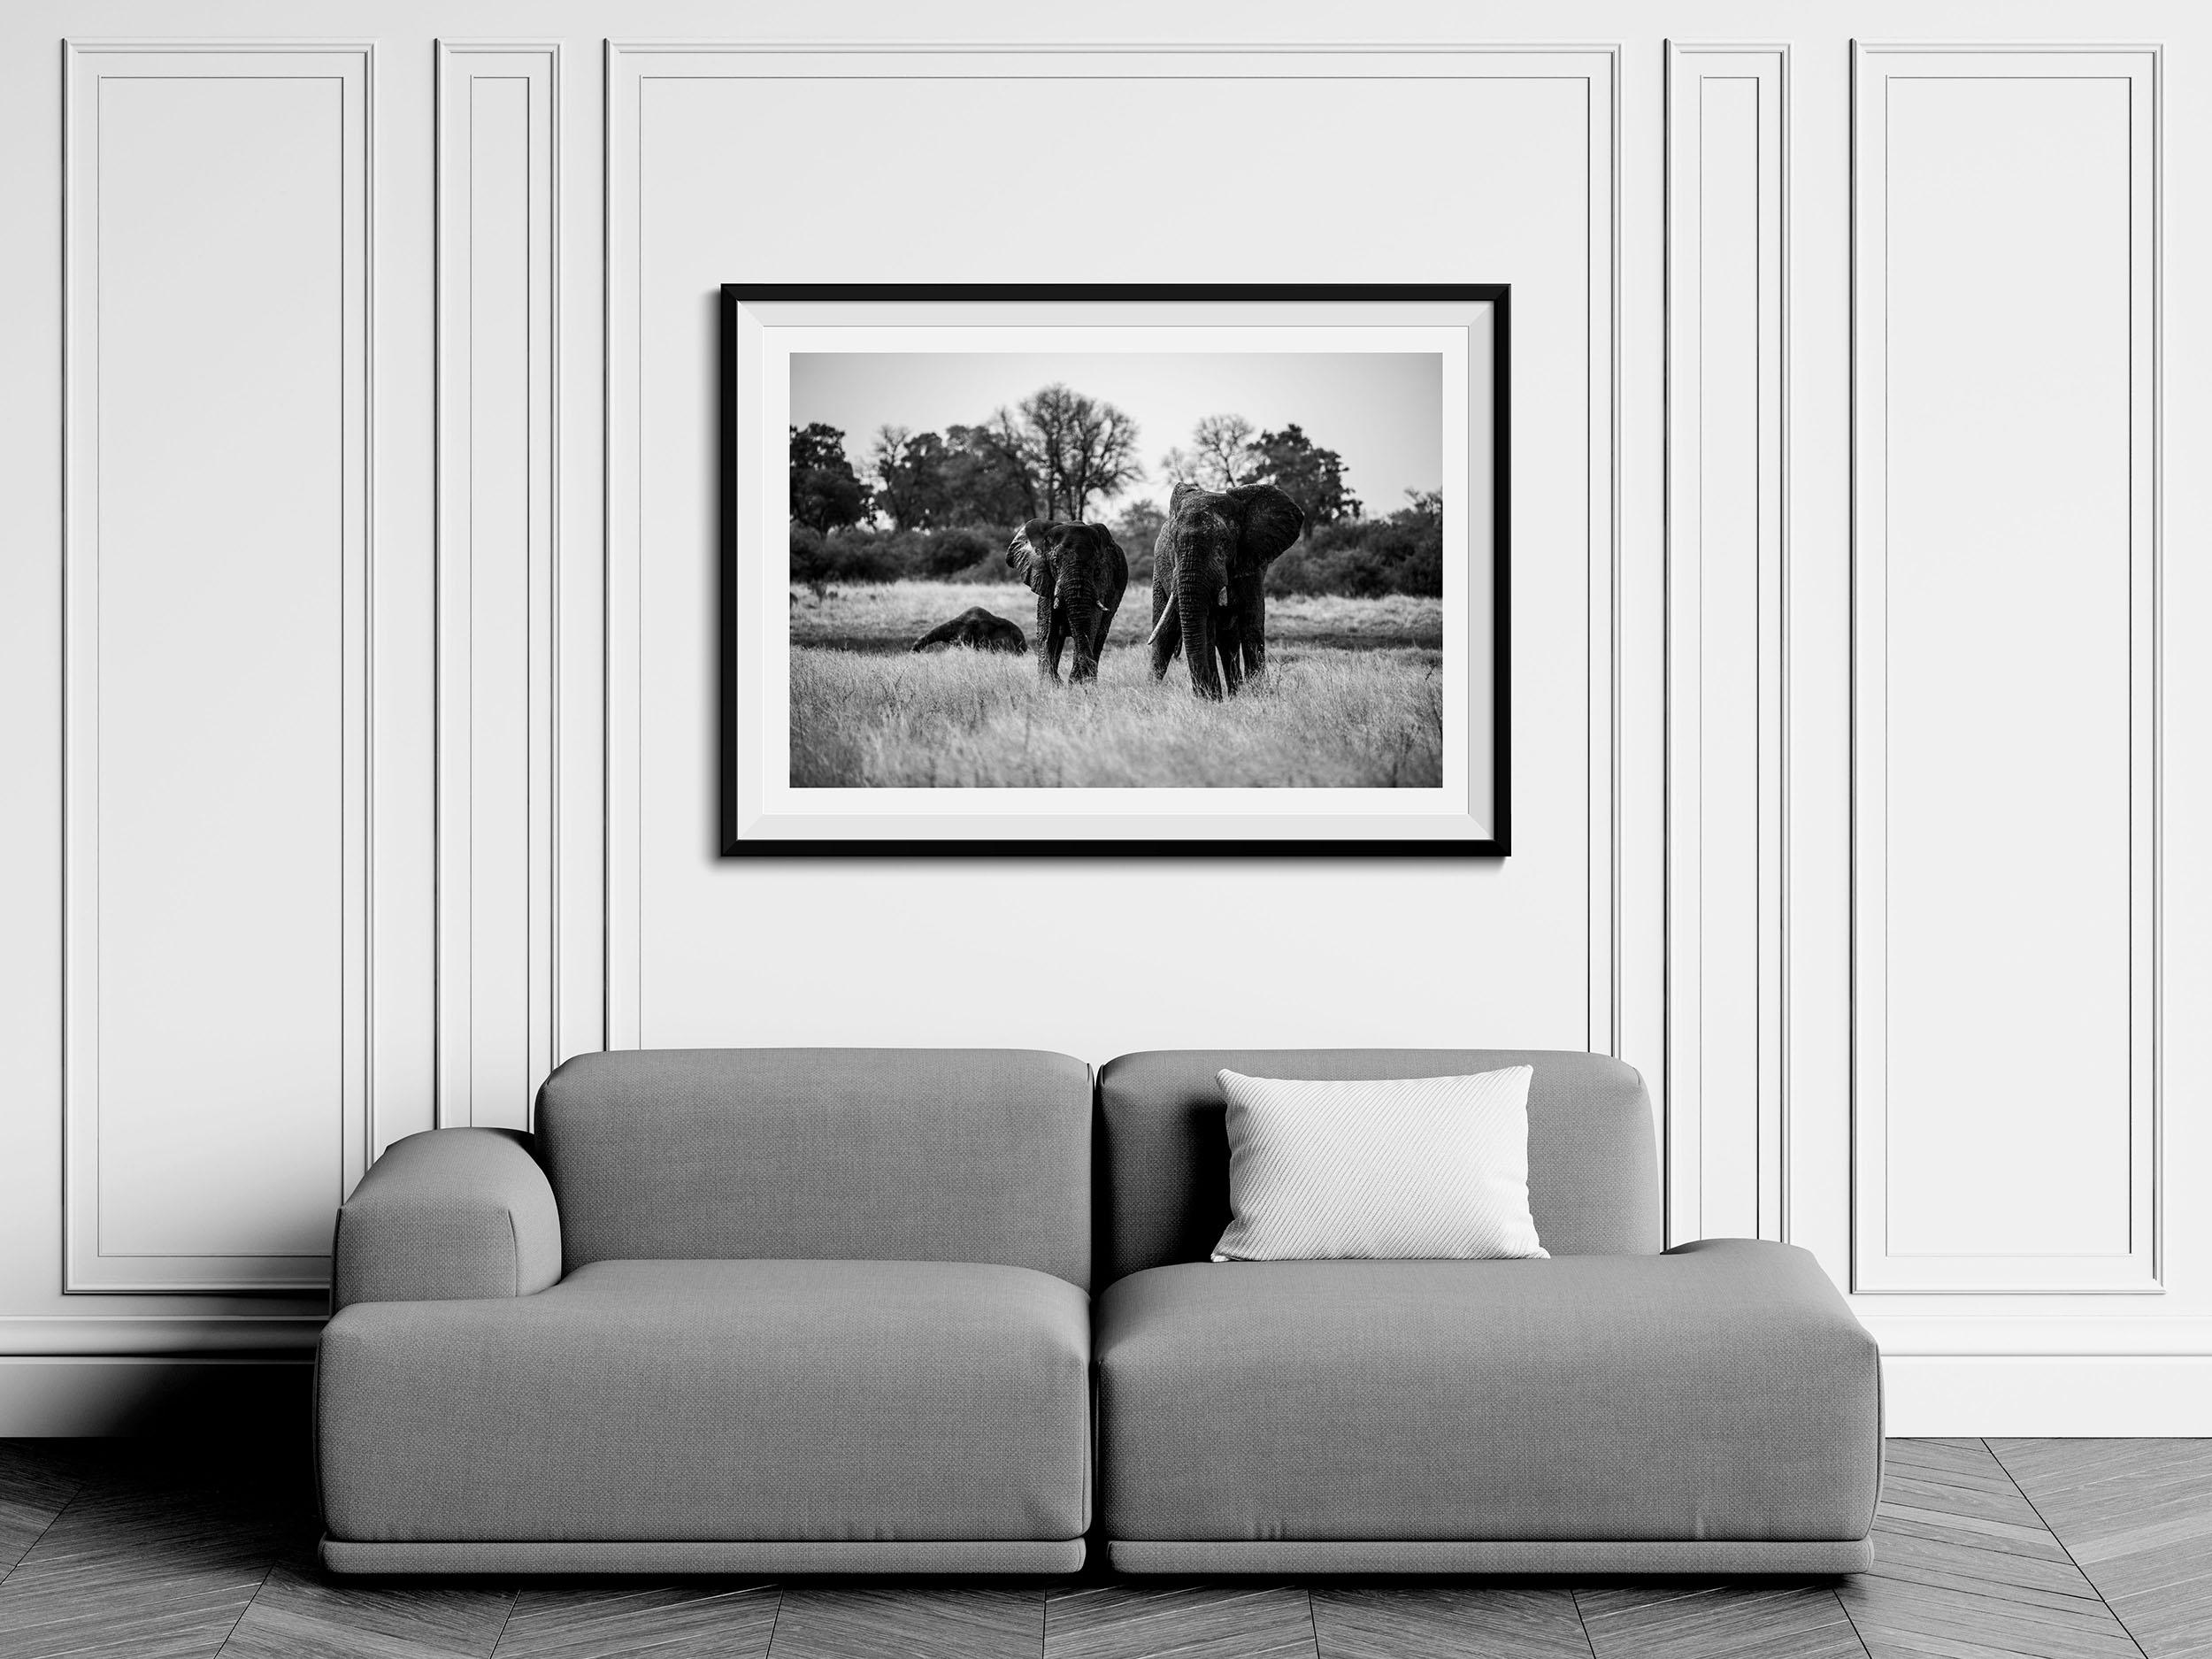 Venerable - Fine Art Photography Print